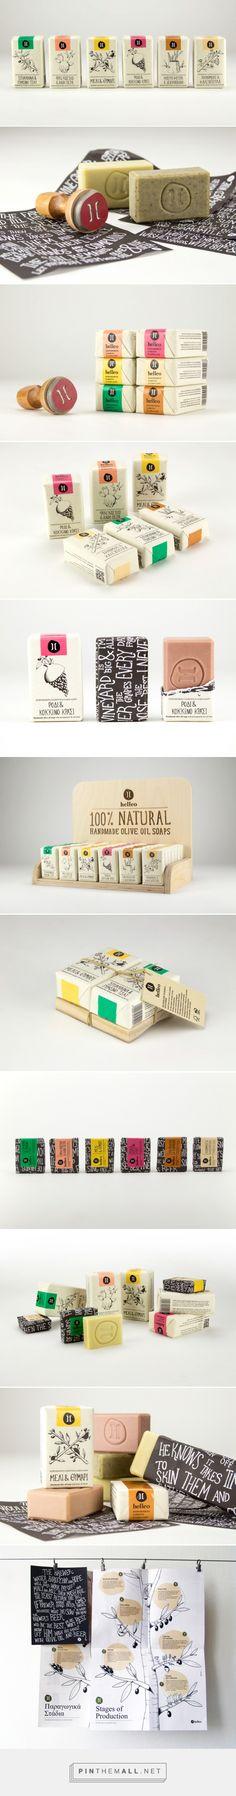 Packaging Design for \'Helleo\' Natural Soaps